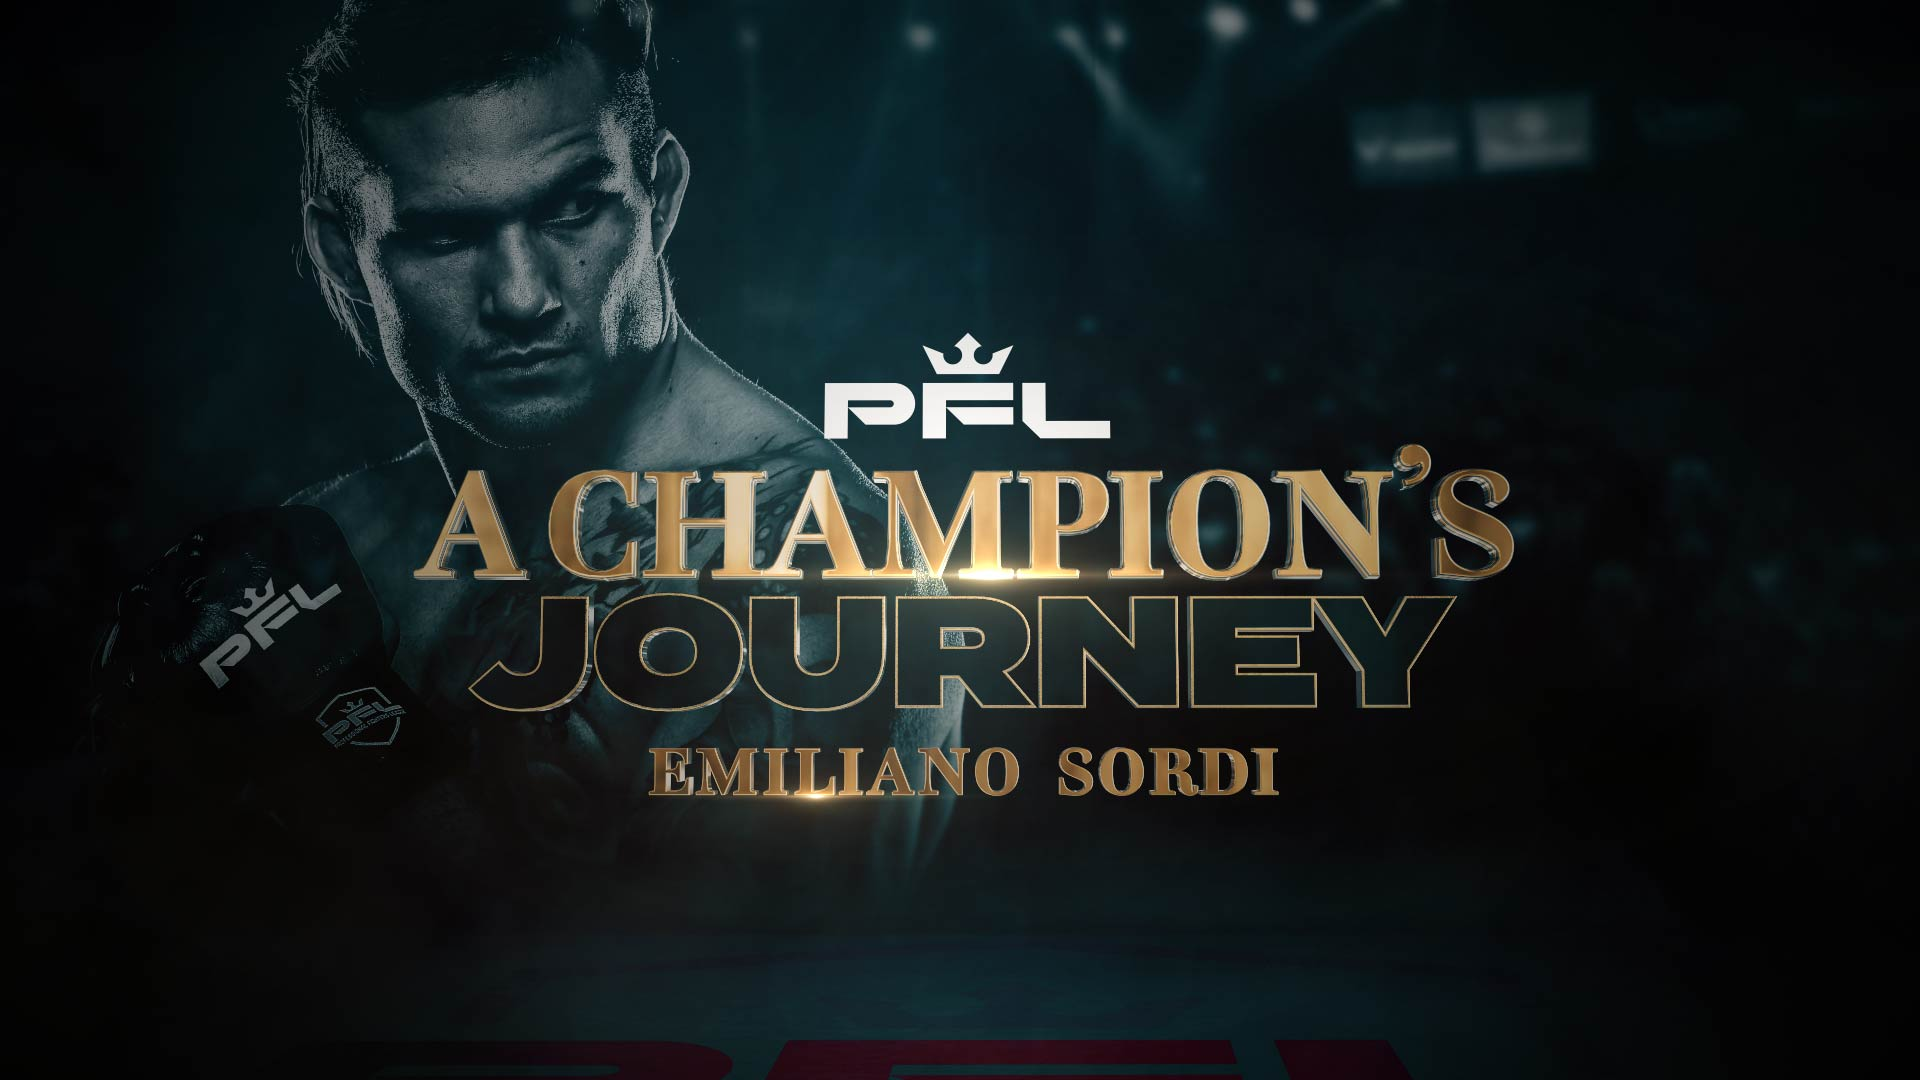 A Champion's Journey: Emiliano Sordi Extended Clip